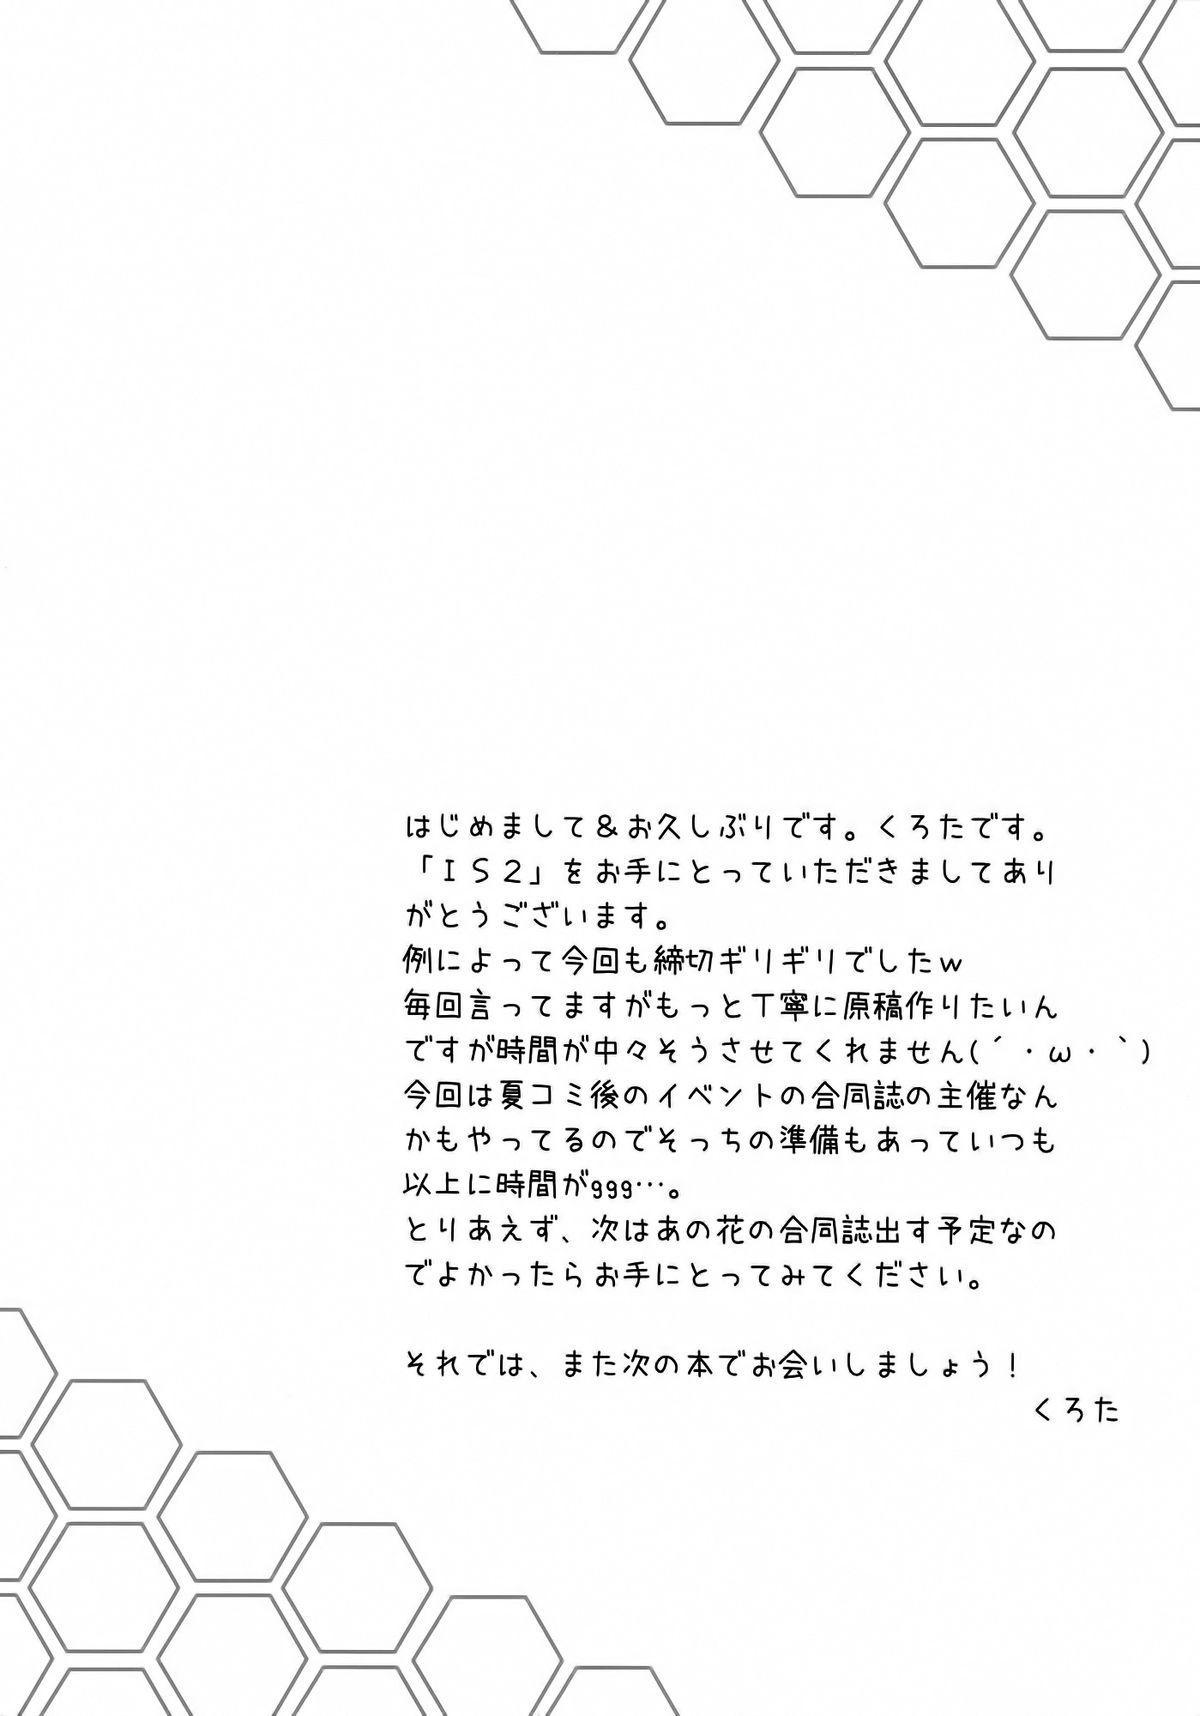 Ichika, Sekinin Torinasai! SECOND | Ichika, You Better Take Responsibility! Second 15